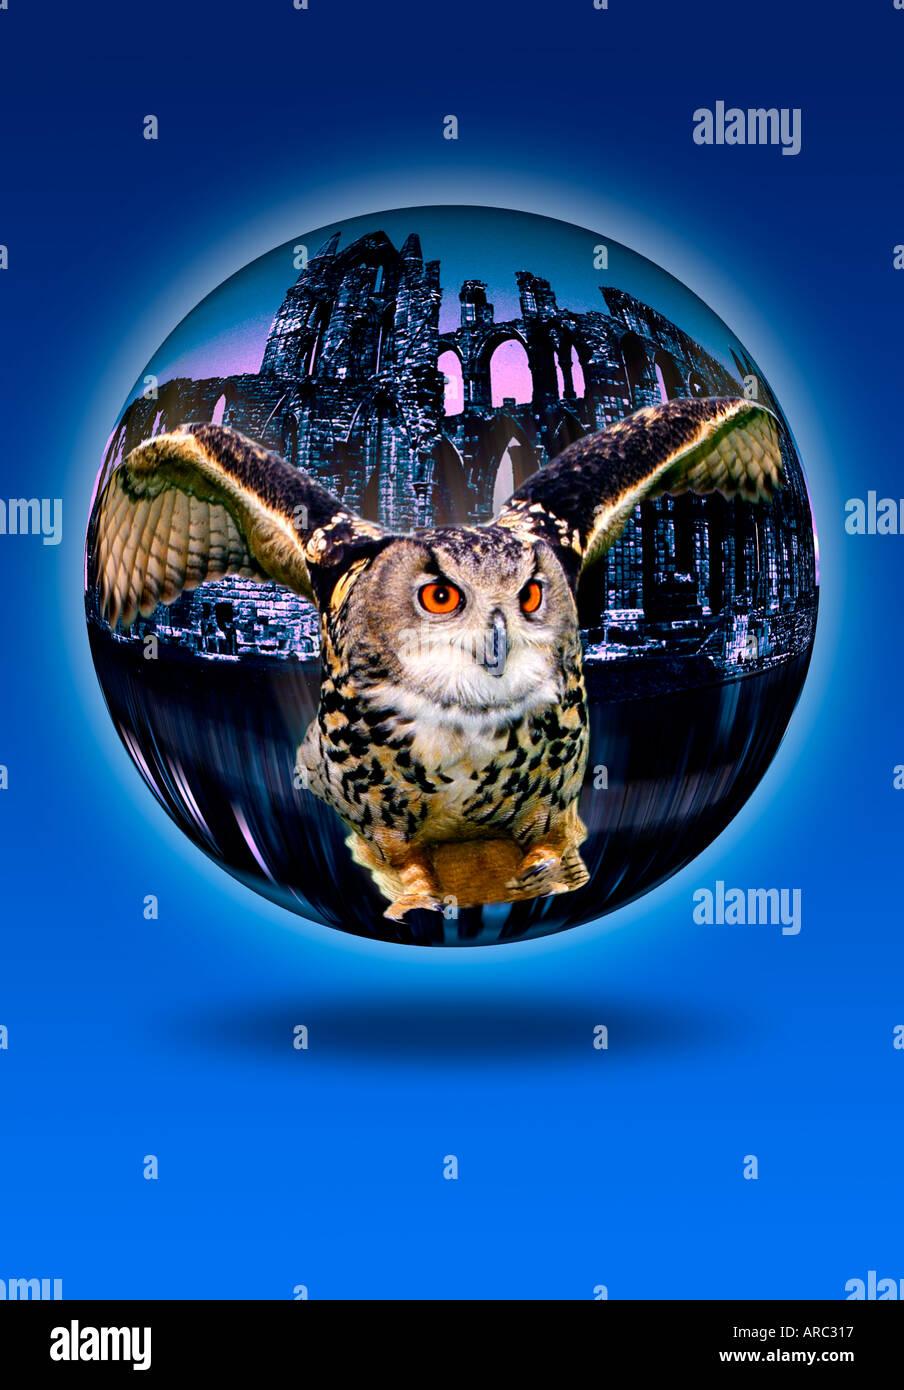 Owl crystal ball concept Photo Stock